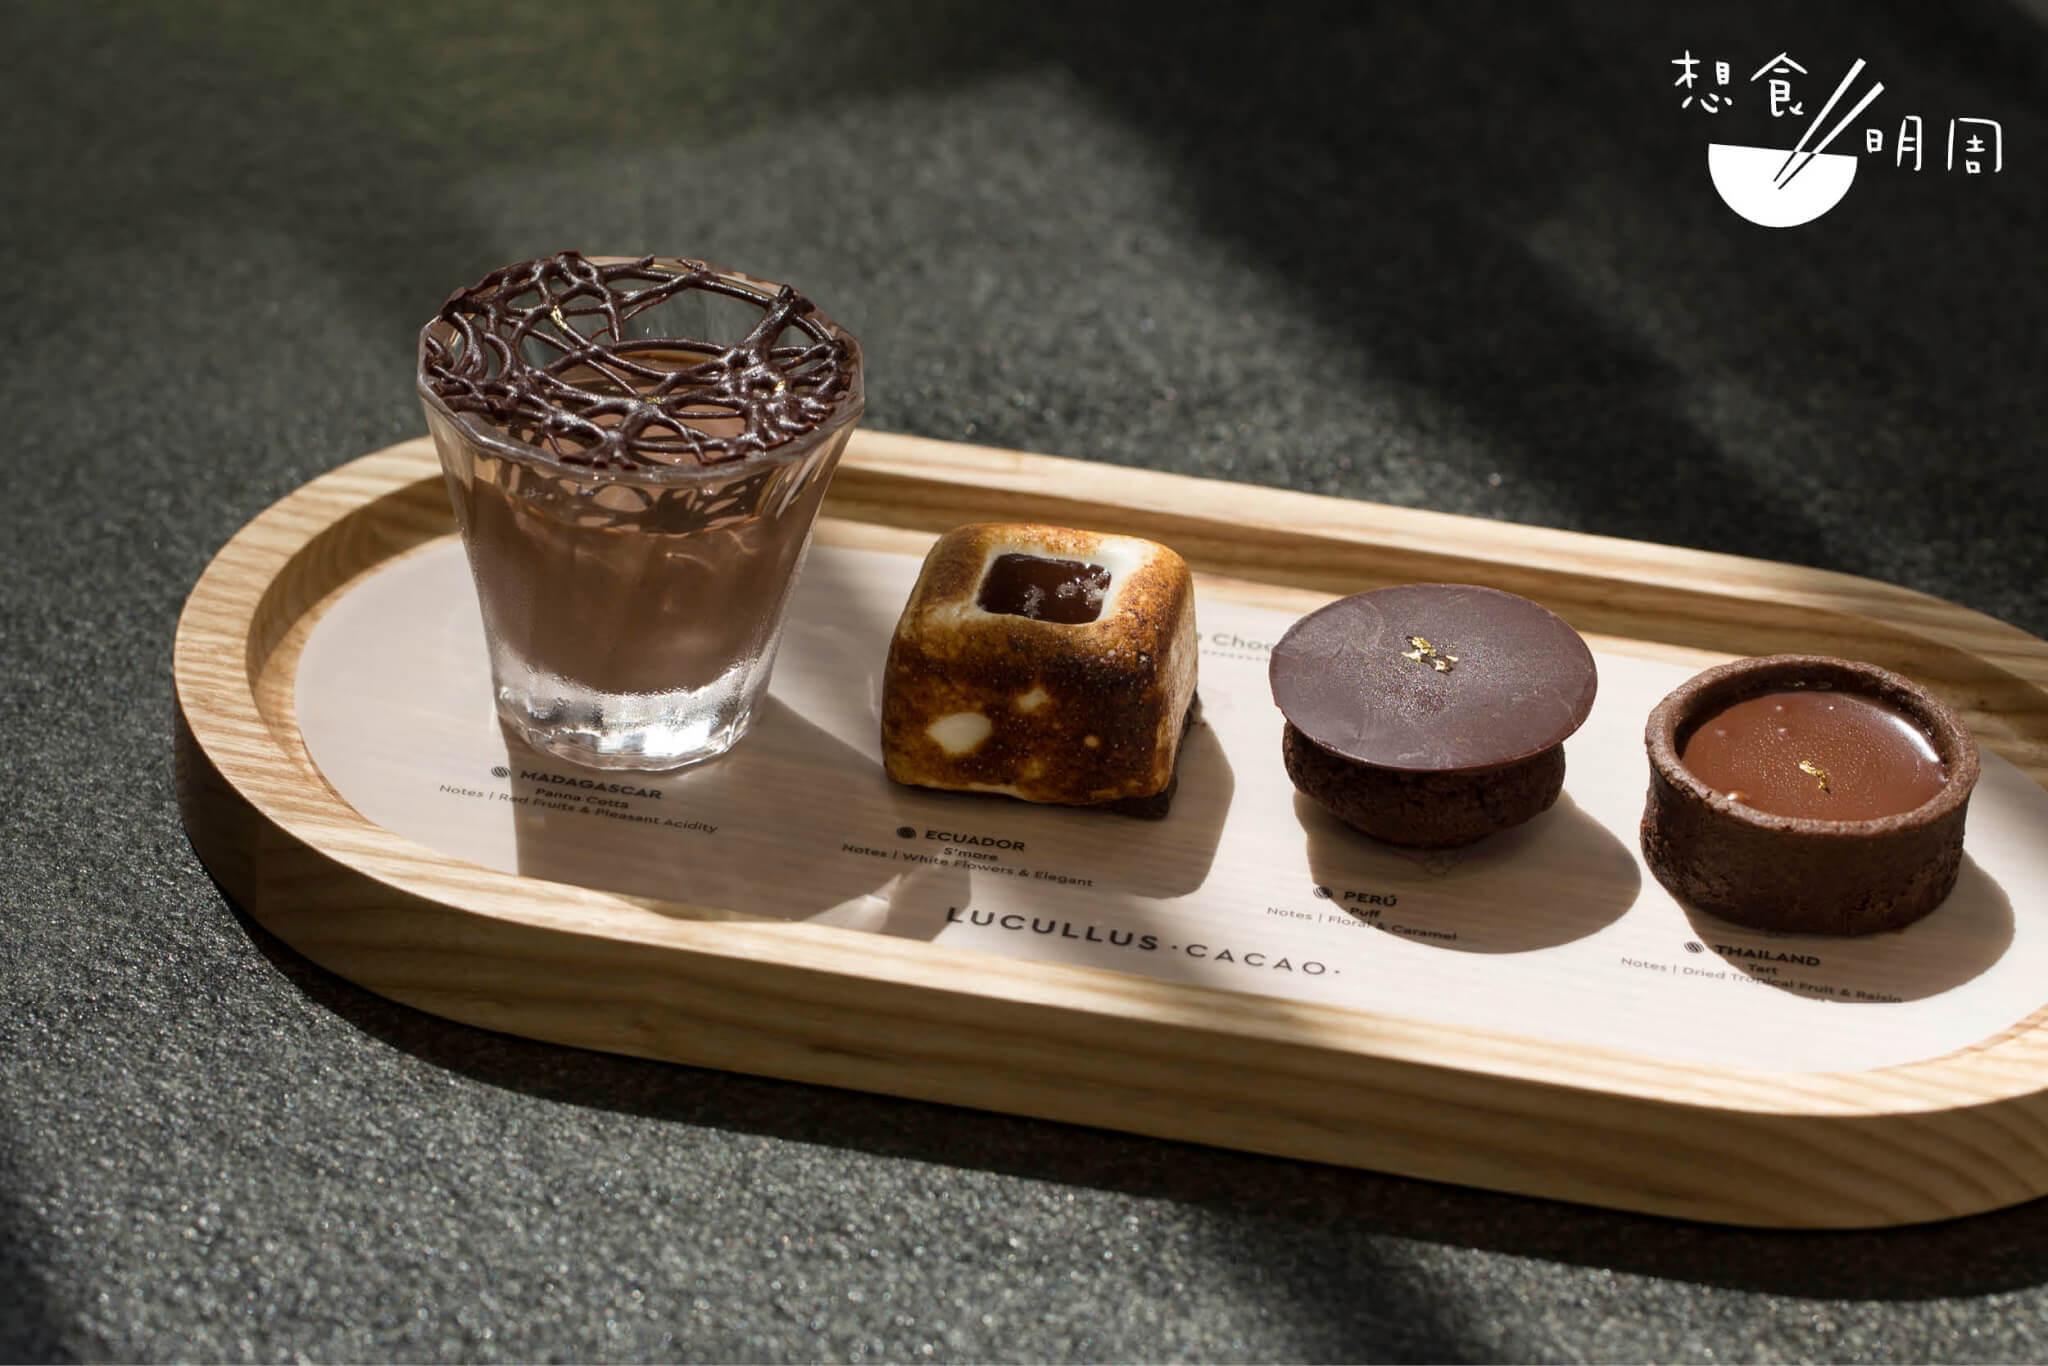 Single Origin Chocolate Flight // 左起:朱古力奶凍、烤棉花糖朱古力撻、朱古力泡芙、朱古力撻。($118)